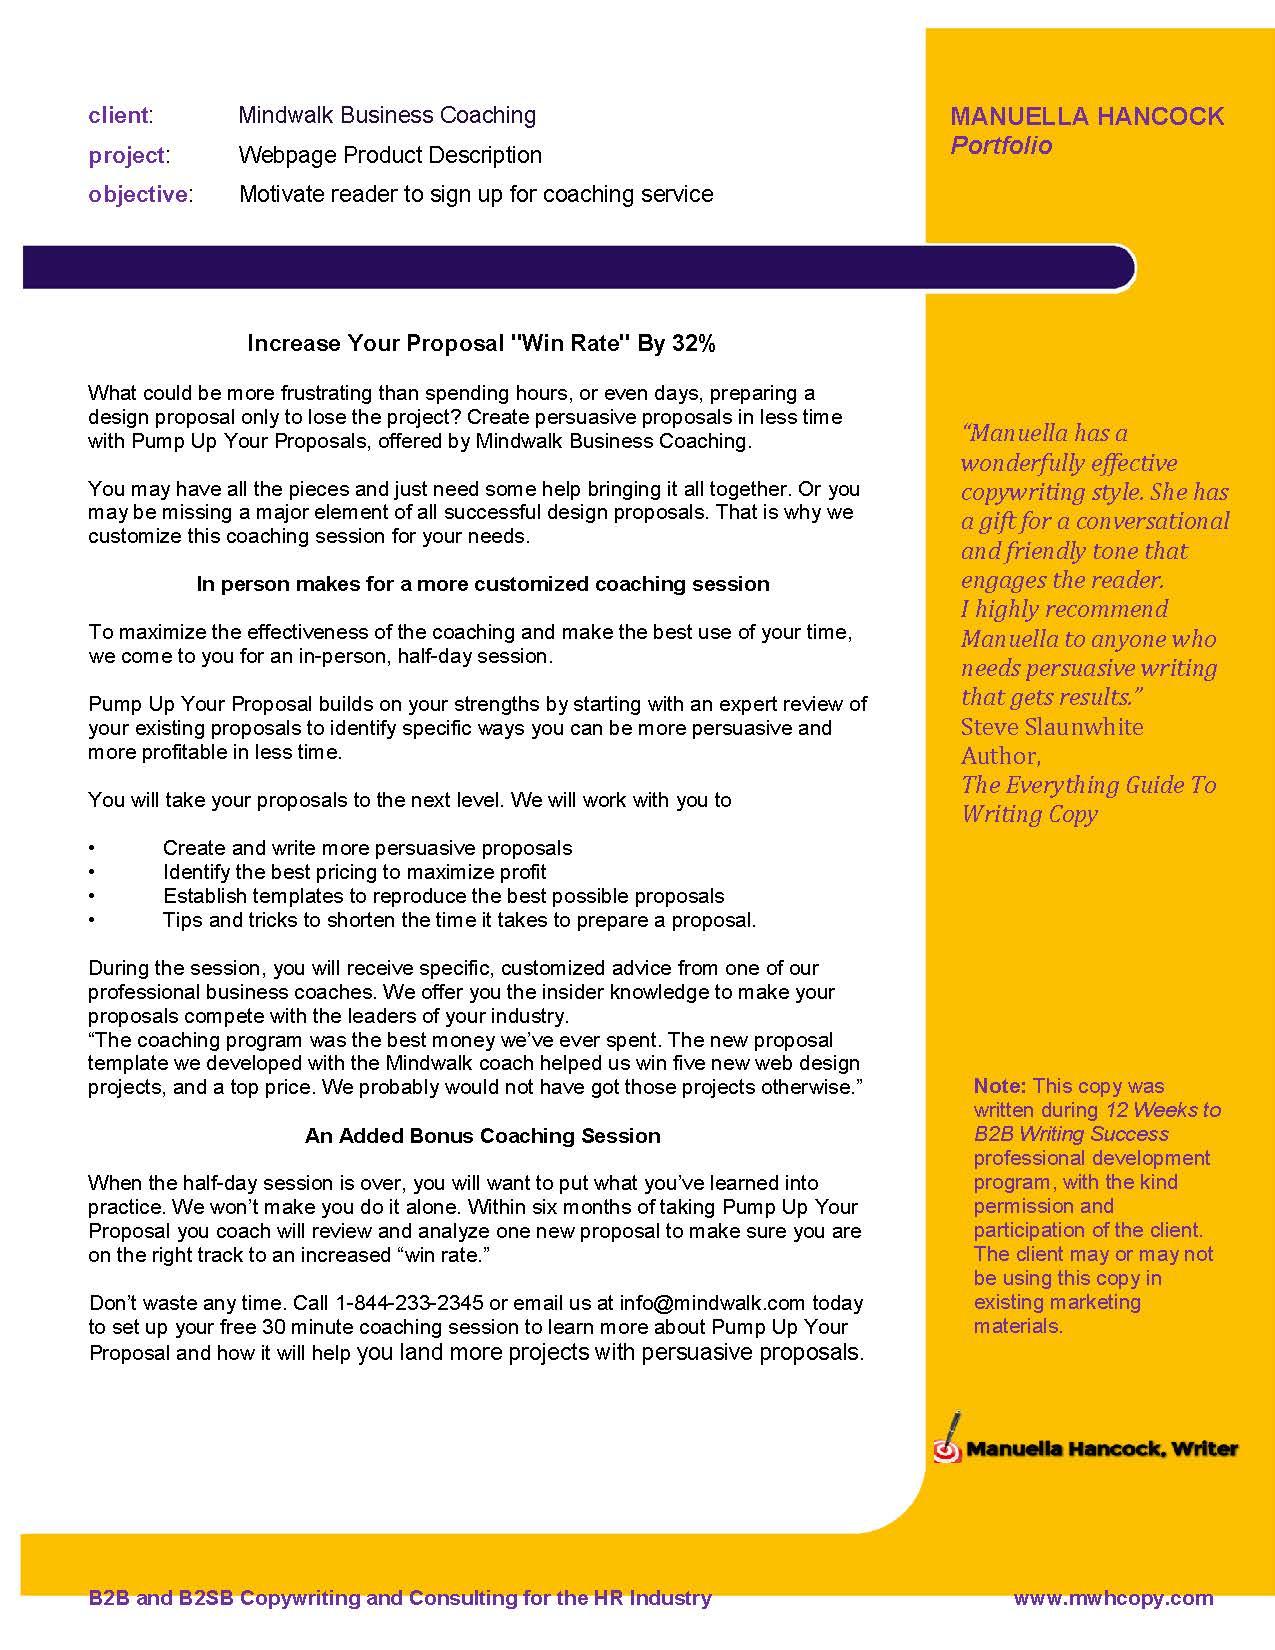 Image of Employee Handbook PDF